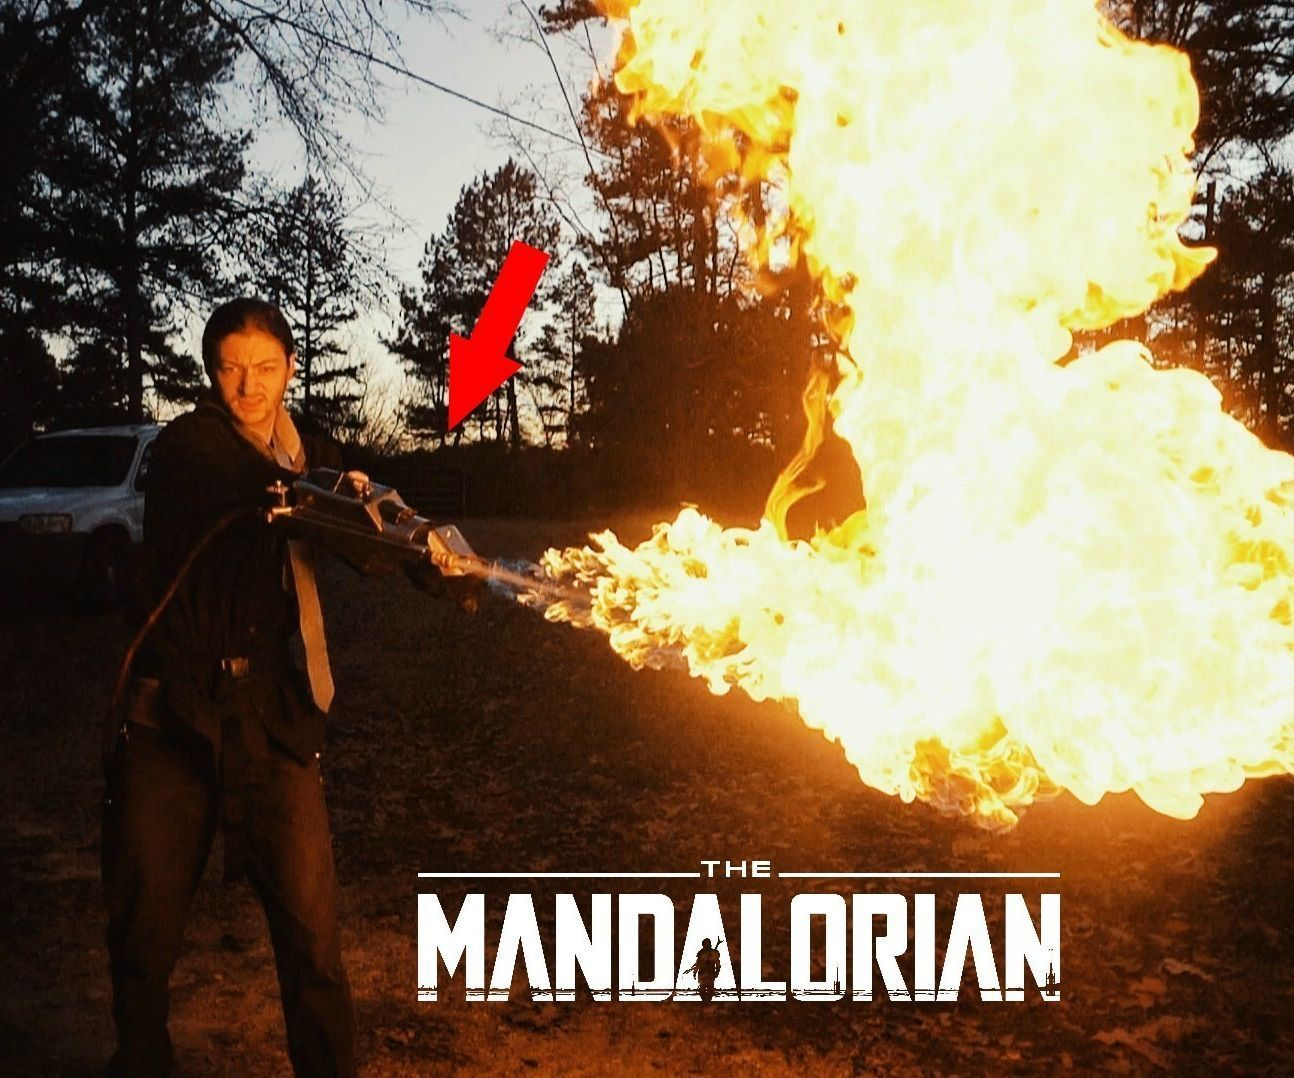 The Mandalorian FLAMETHROWER Gauntlet